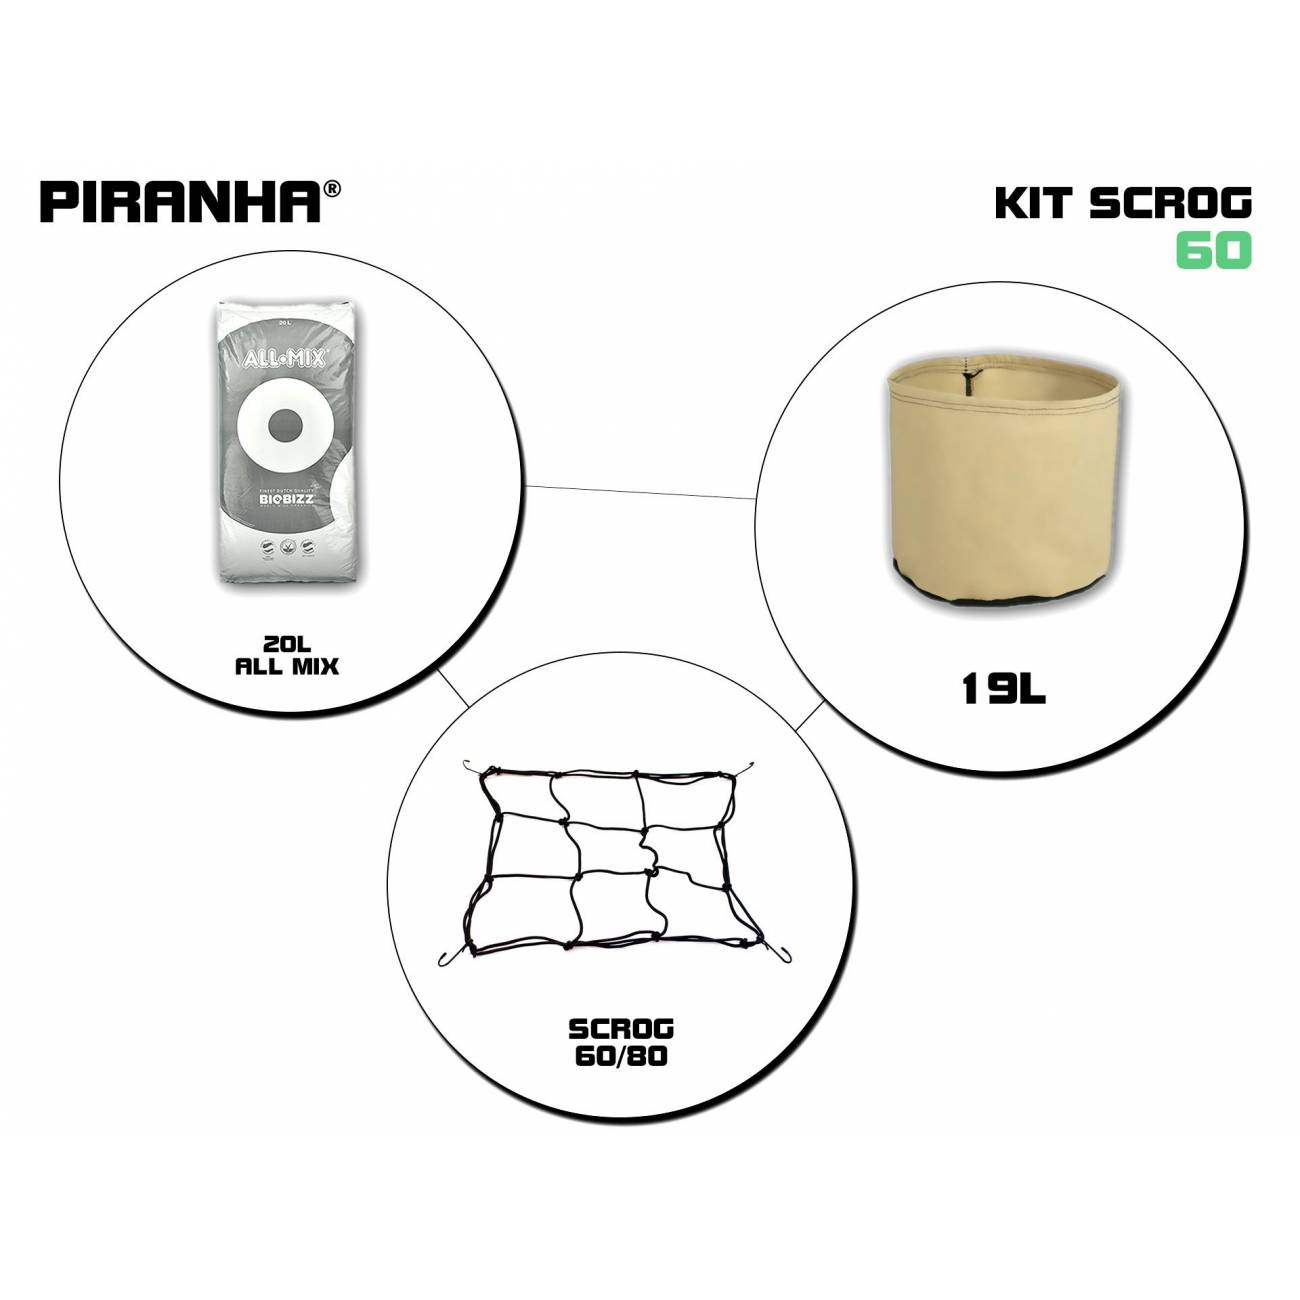 Kit SCROG 60